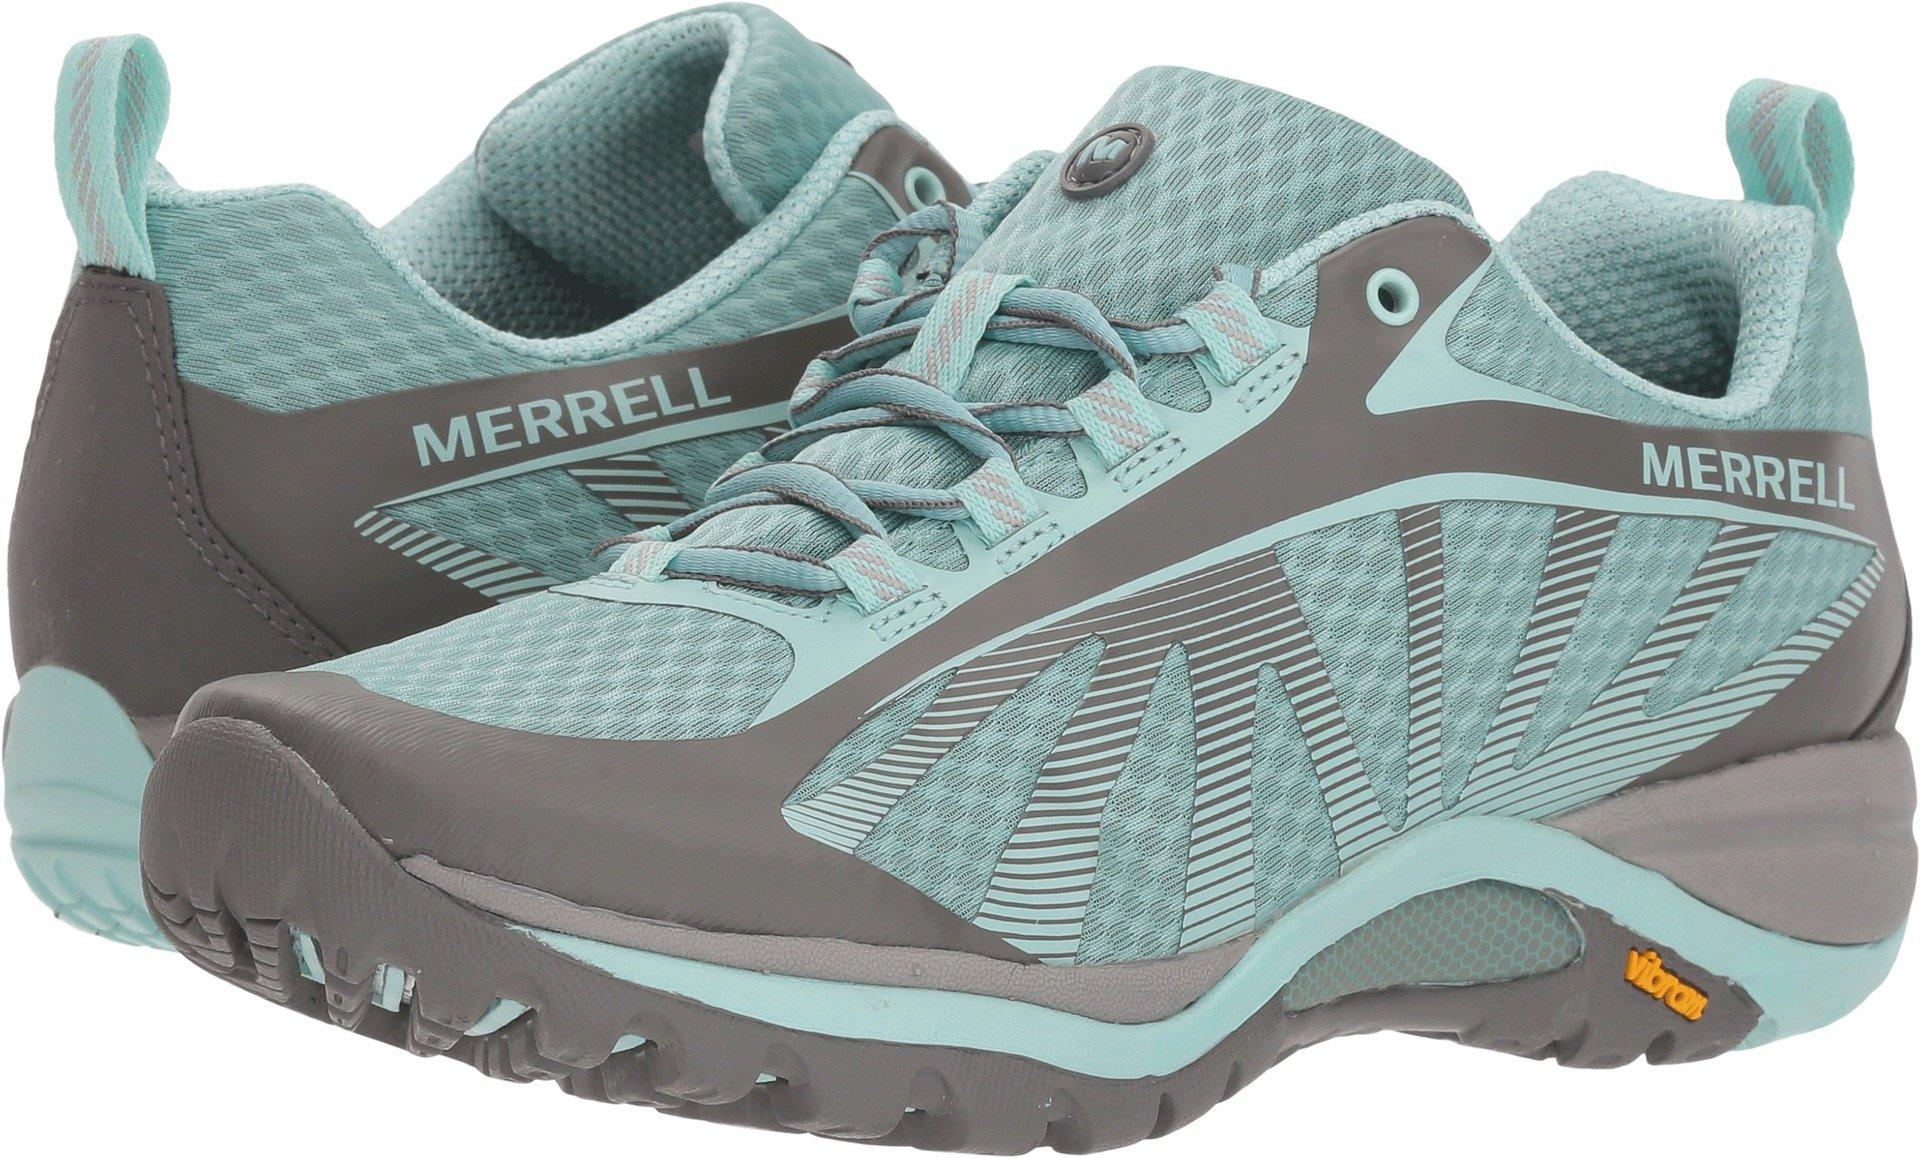 Merrell Womens Siren Edge Trail Runner, Bleached Aqua, 6.5 B(M) US